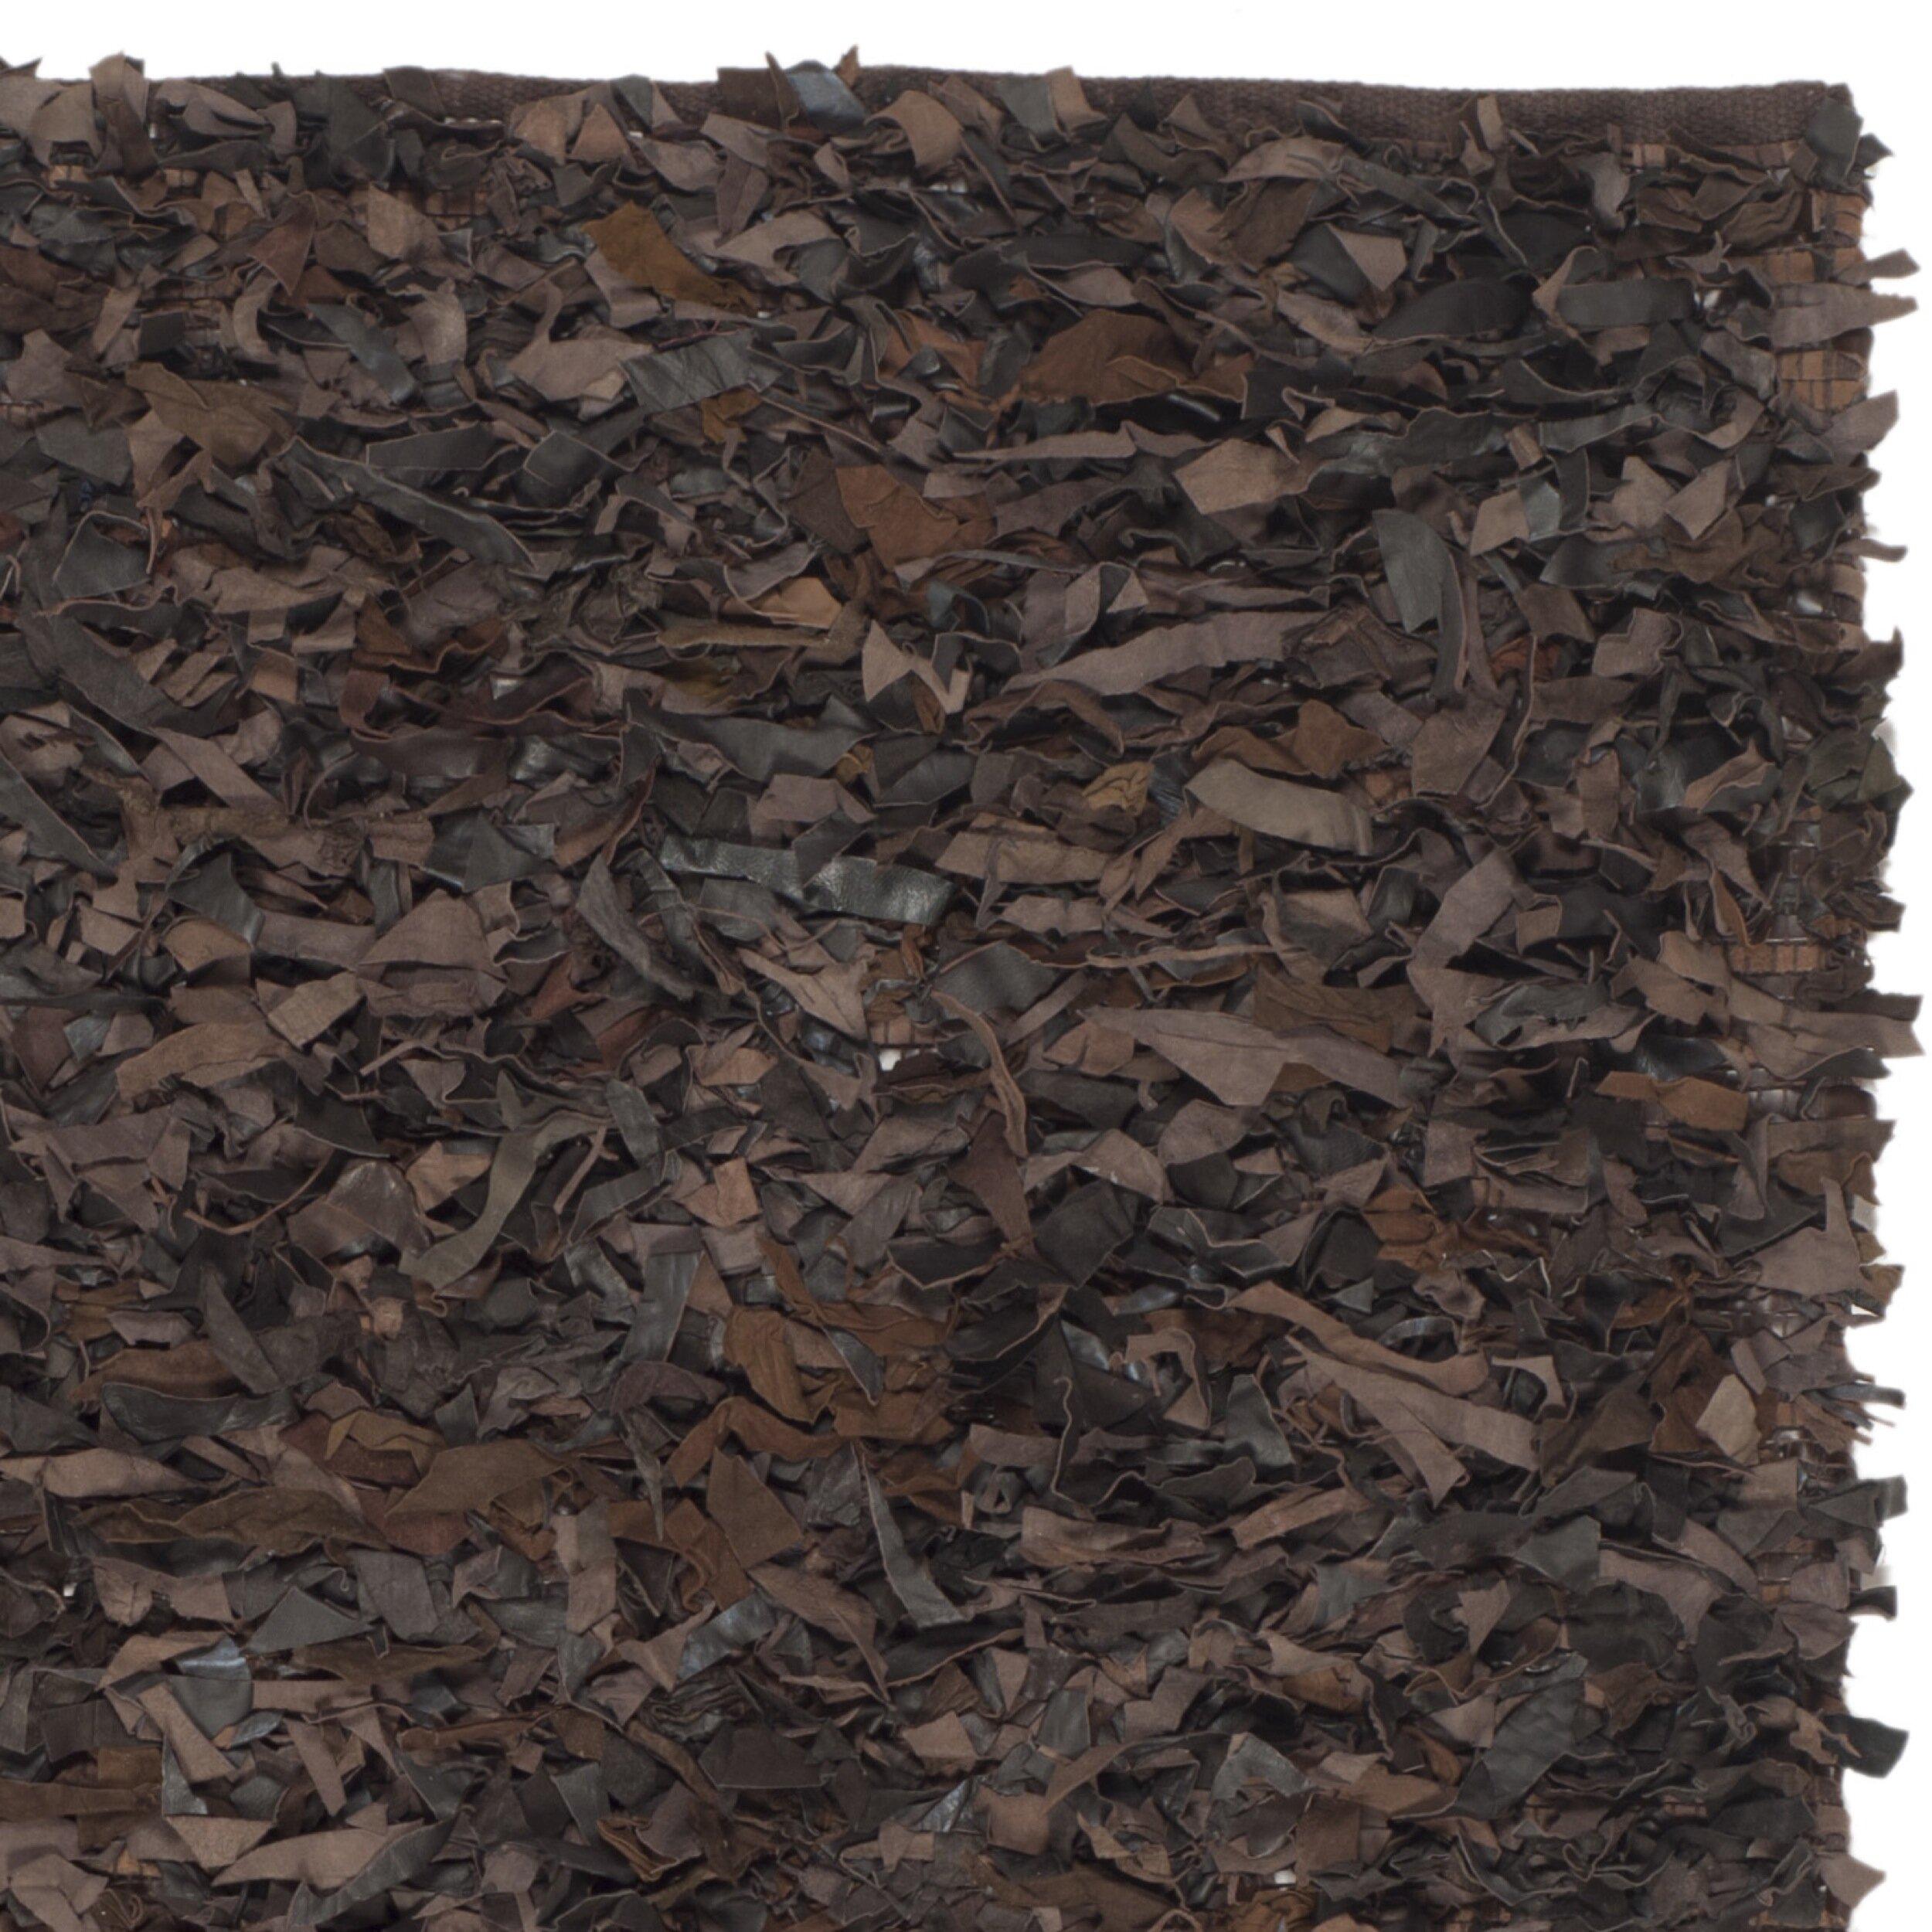 Safavieh Leather Shag Dark Brown Area Rug Amp Reviews